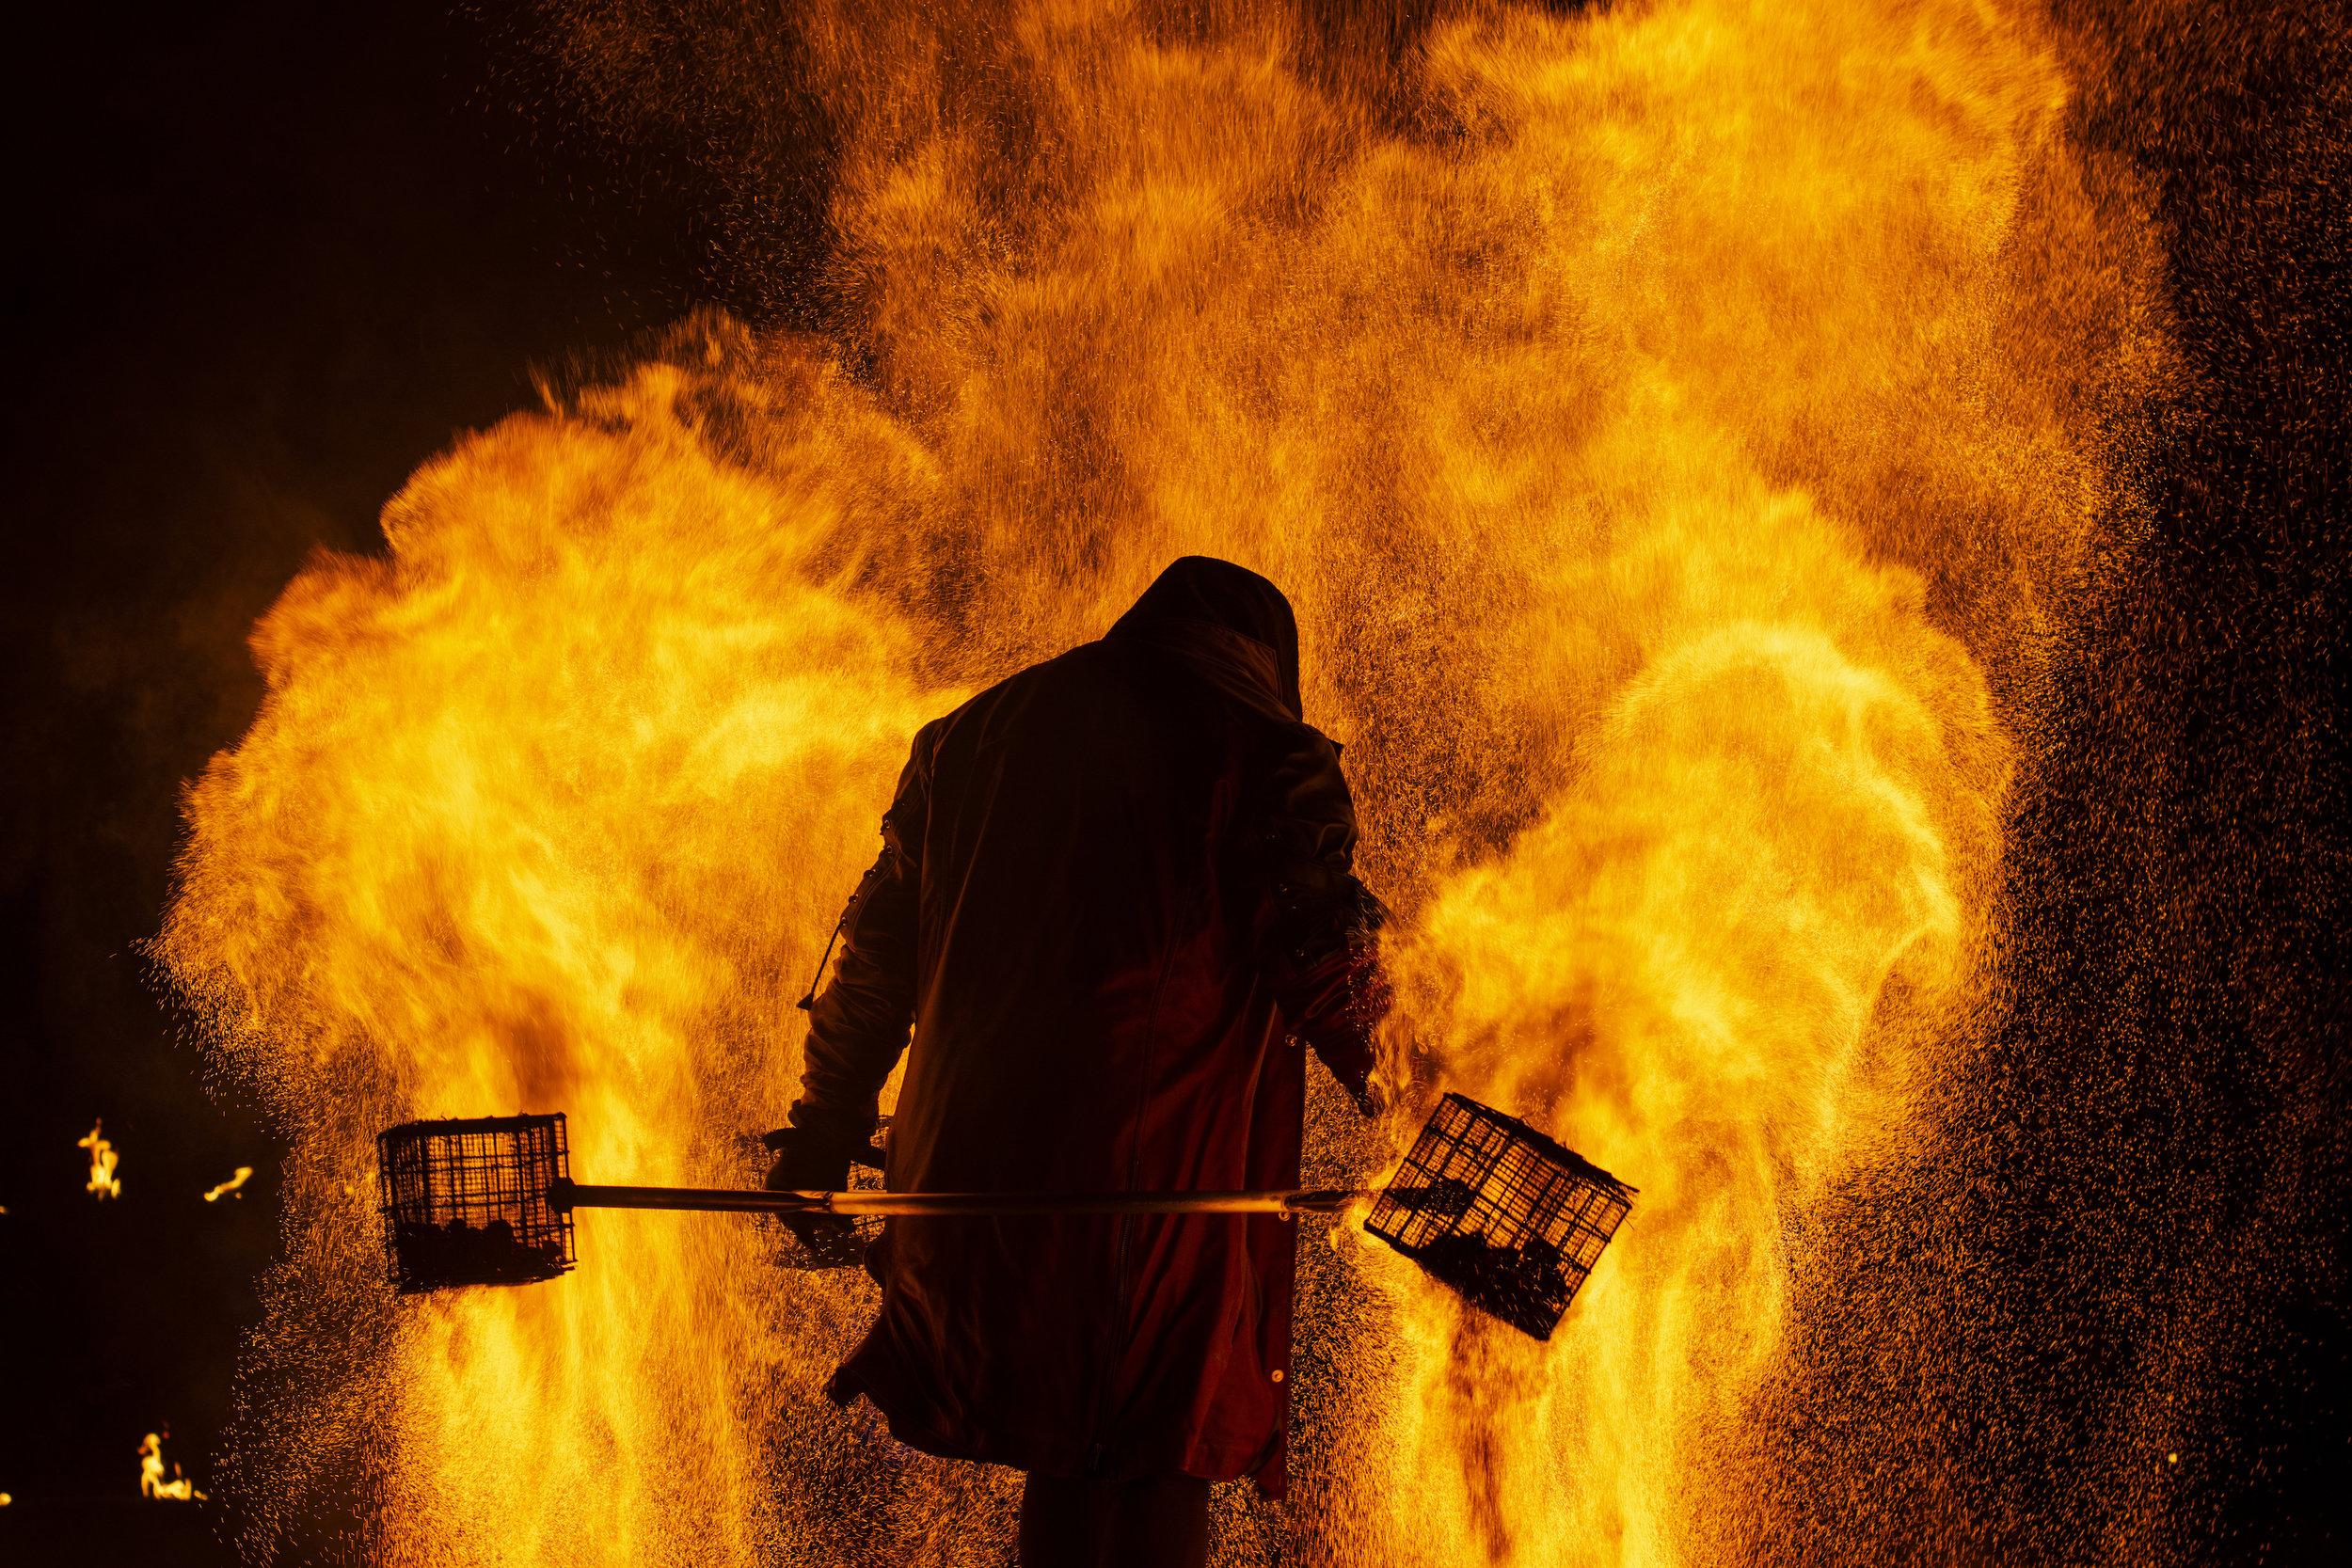 """Fire!"" from Flickr user Cedness, used under Creative Commons license https://flic.kr/p/2aGWbV7"